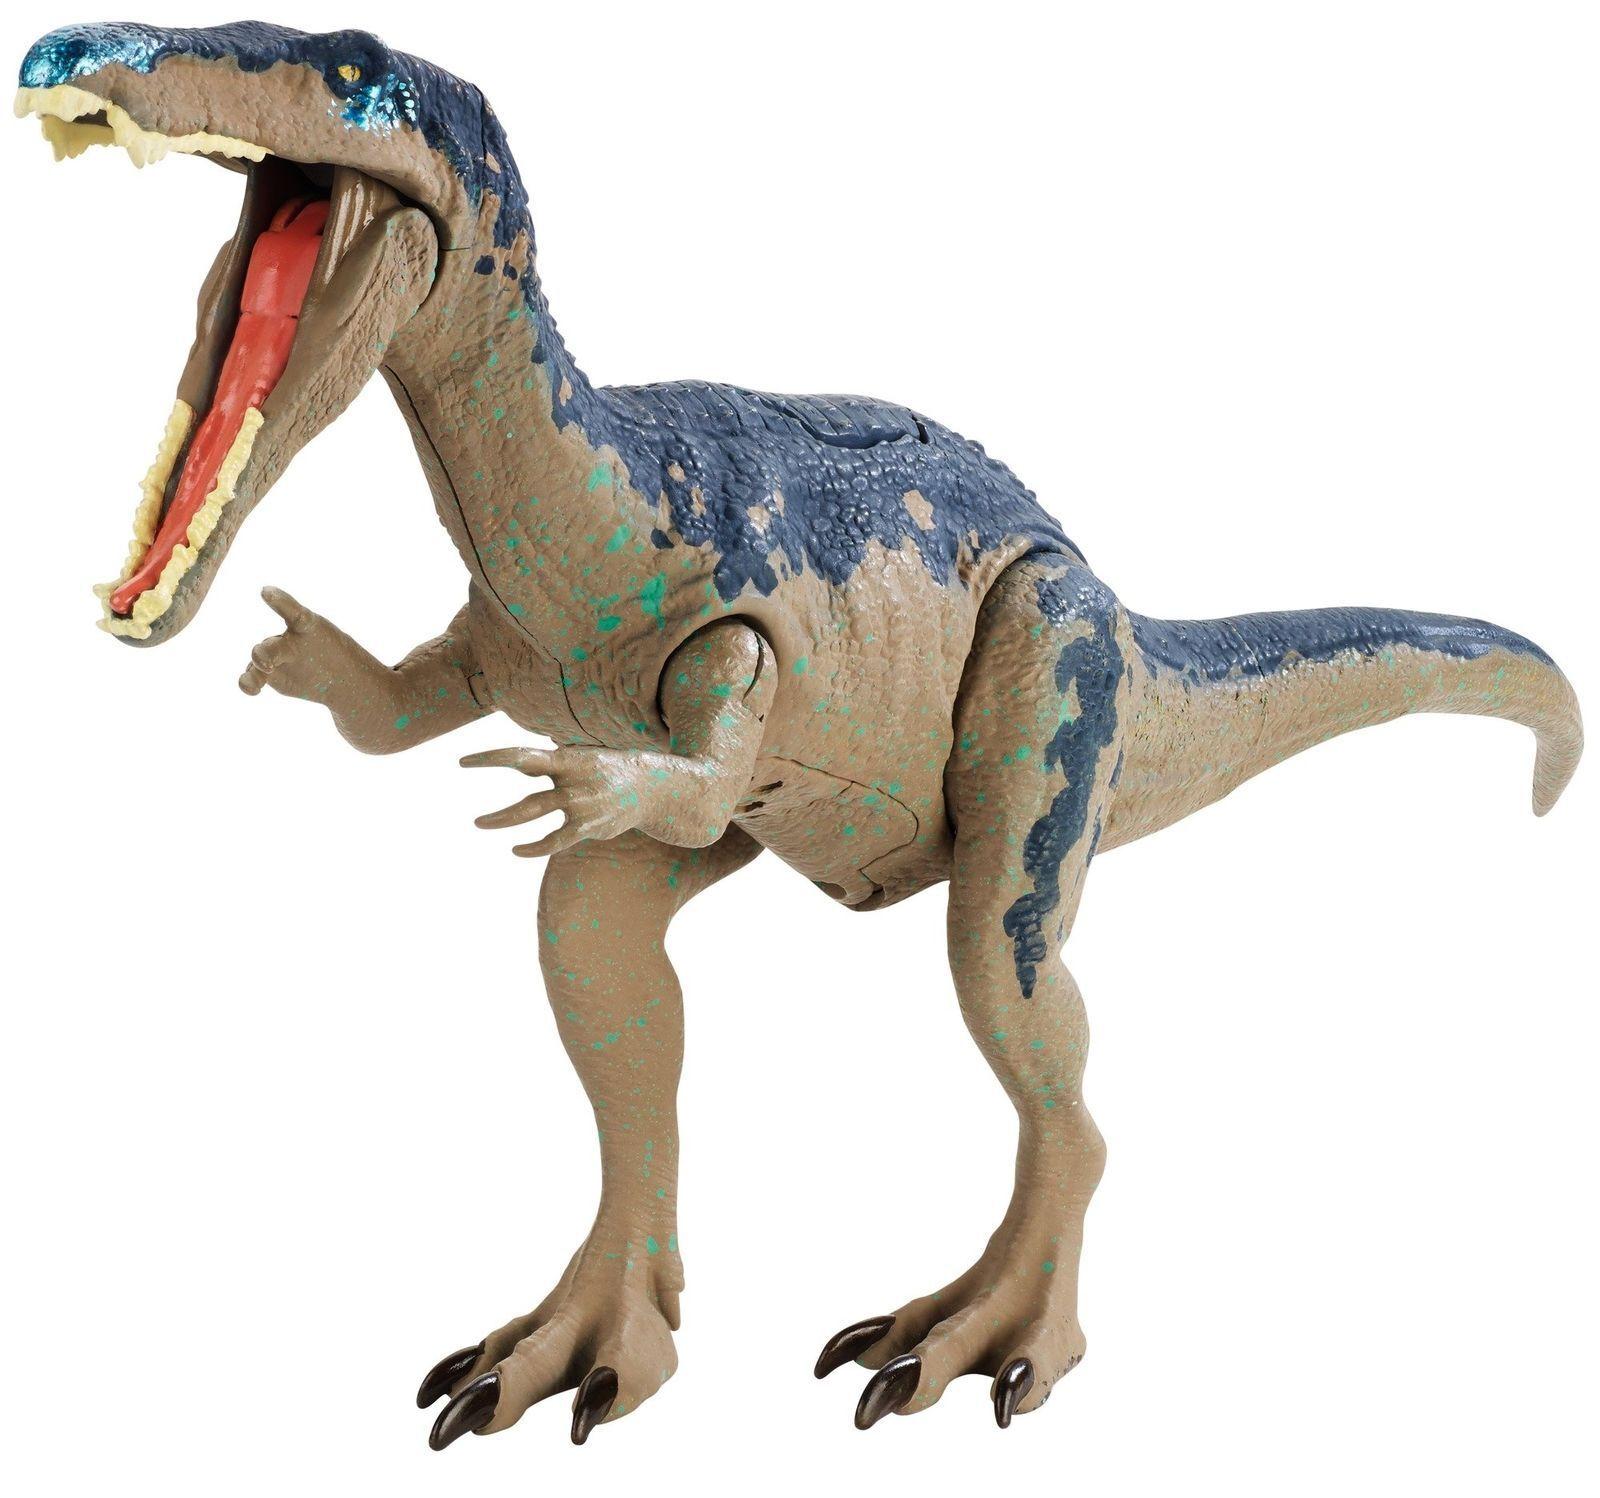 Brand NEW Jurassic World Fallen Kingdom Roarivores Roarivores Roarivores Baryonyx Figure SOUND  c245ee